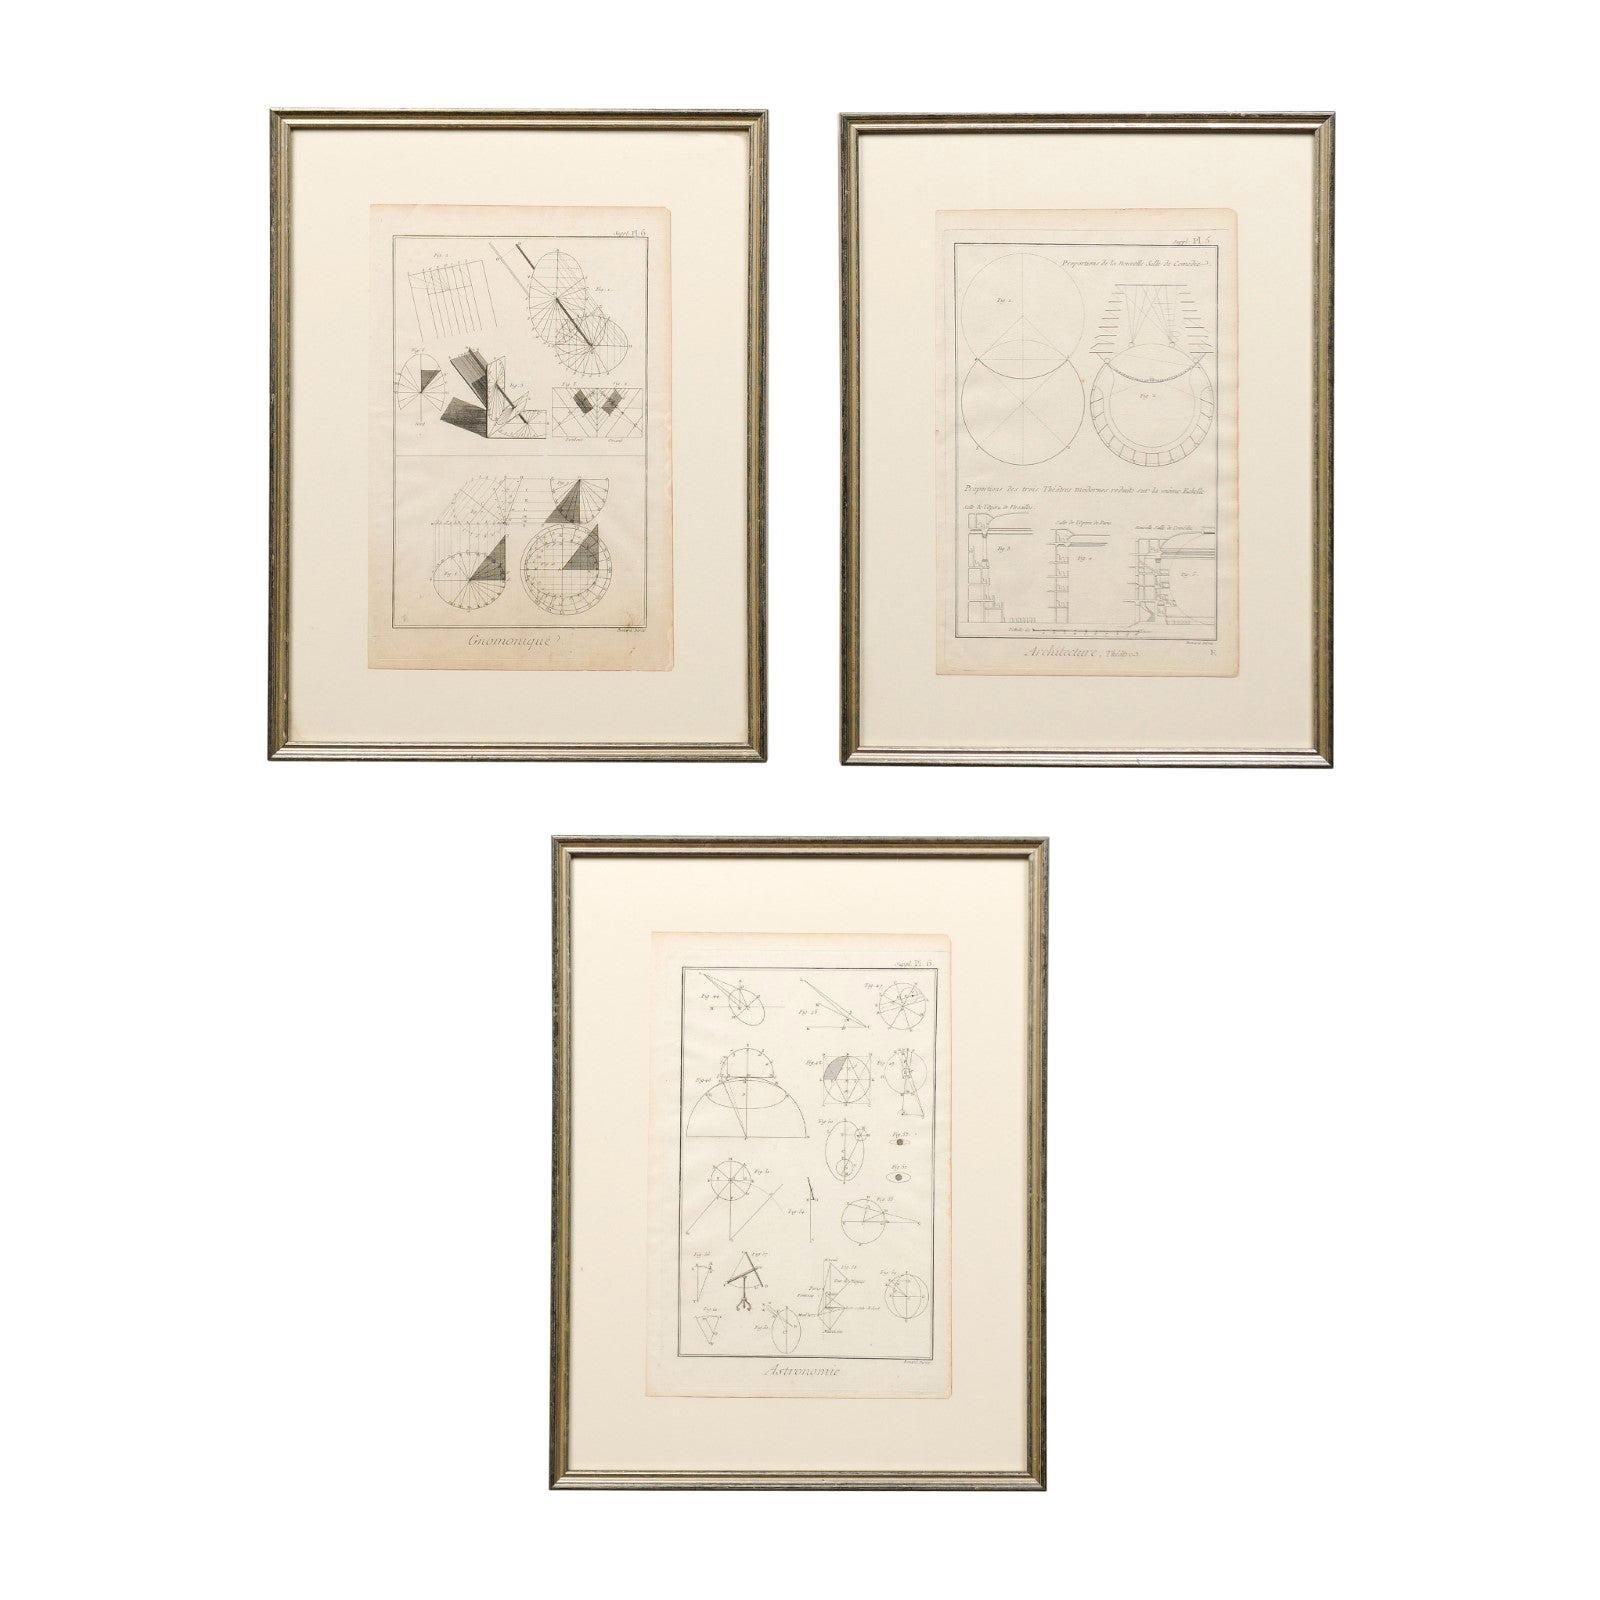 Collection of 3 Framed 18th Century Bernard Direx Geometric Renderings